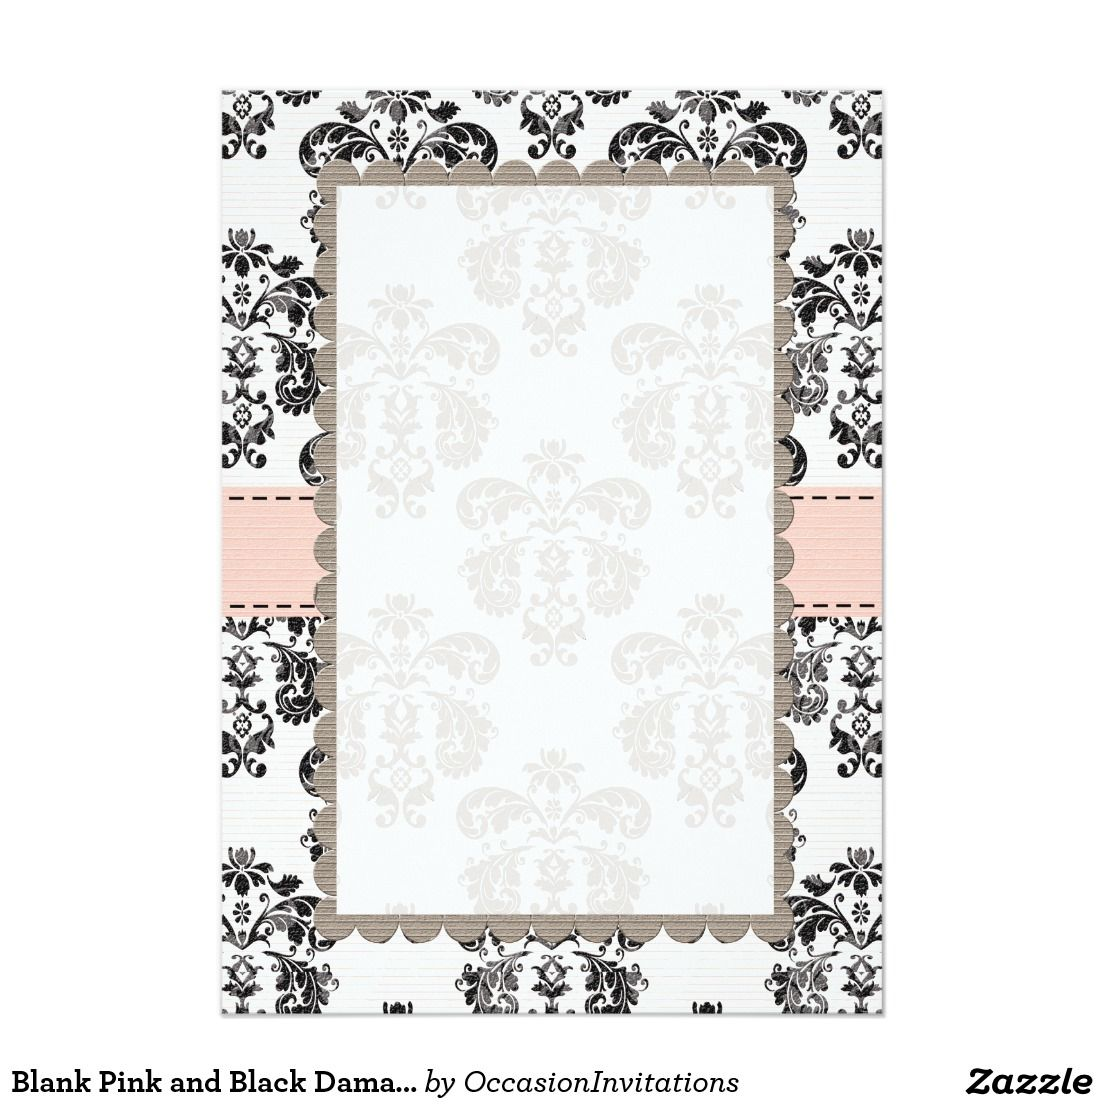 Blank Pink And Black Damask 5x7 Paper Invitation Card: Pink And Black Wedding Invitations Blank At Websimilar.org